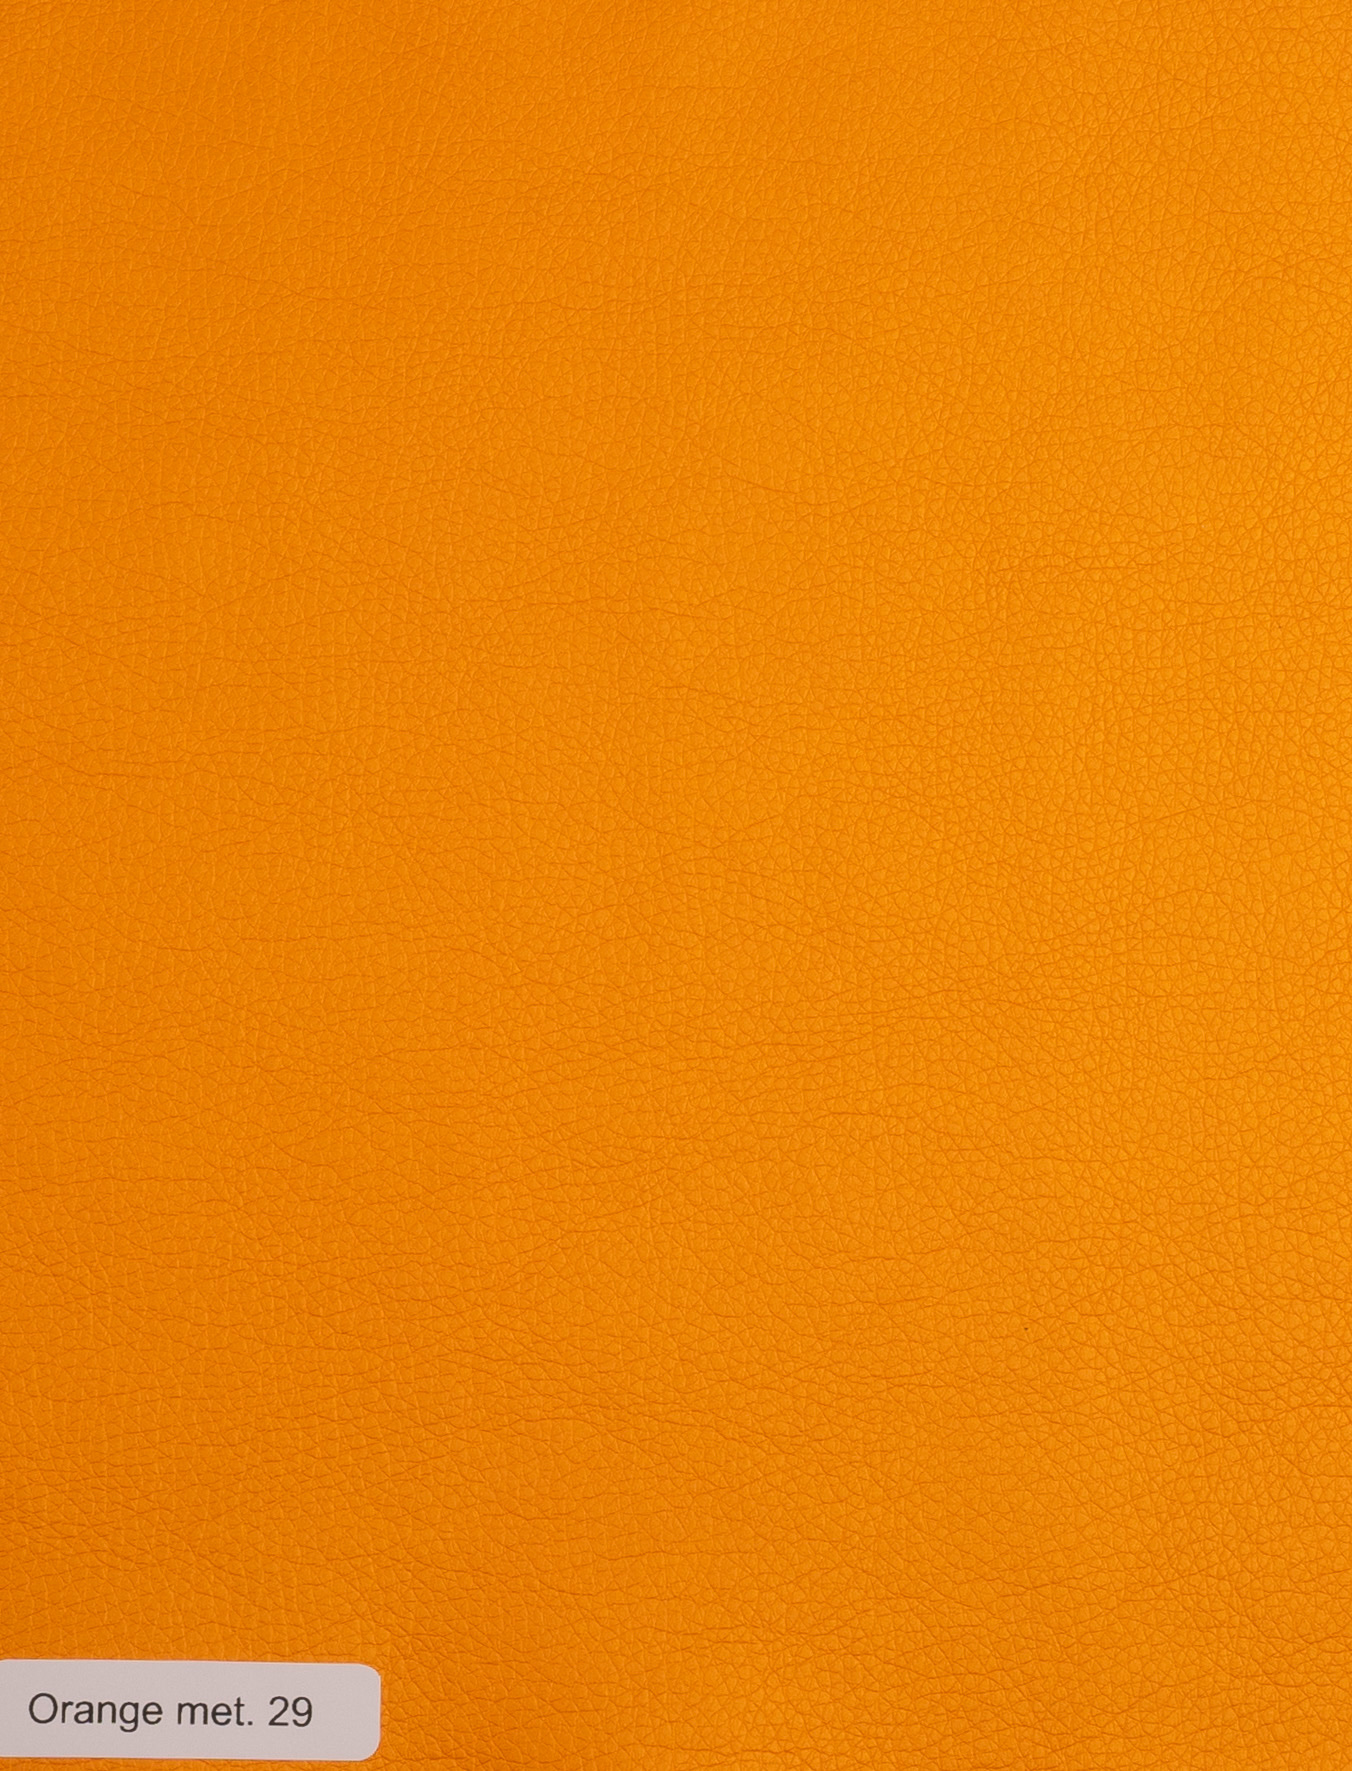 028-029_Orange_metallic